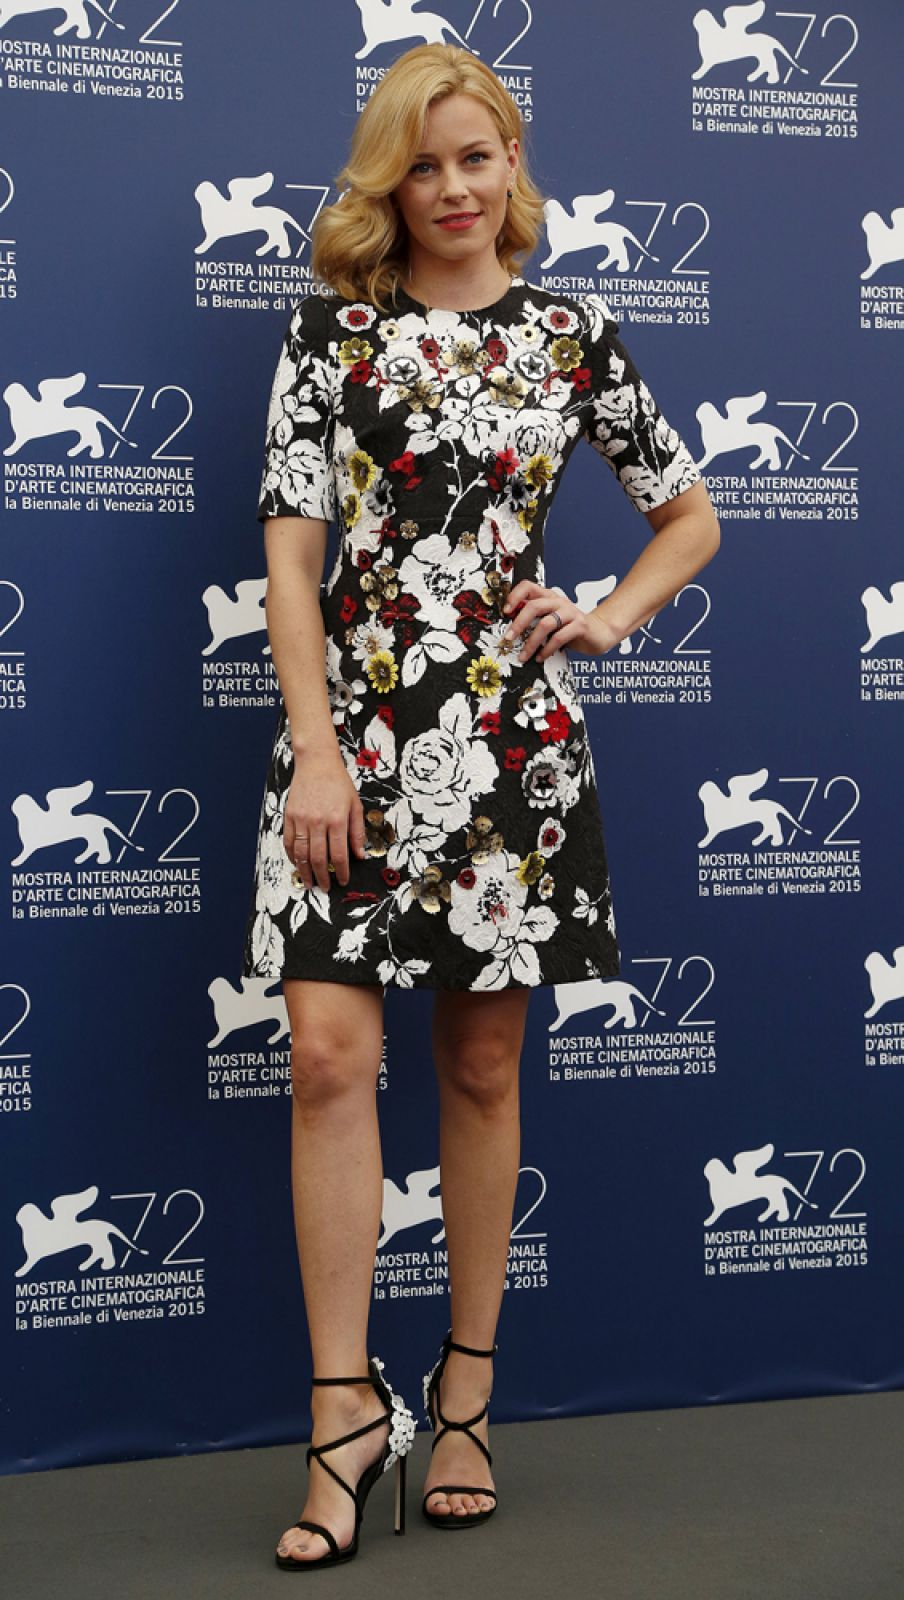 Американская актриса Элизабет Бэнкс.